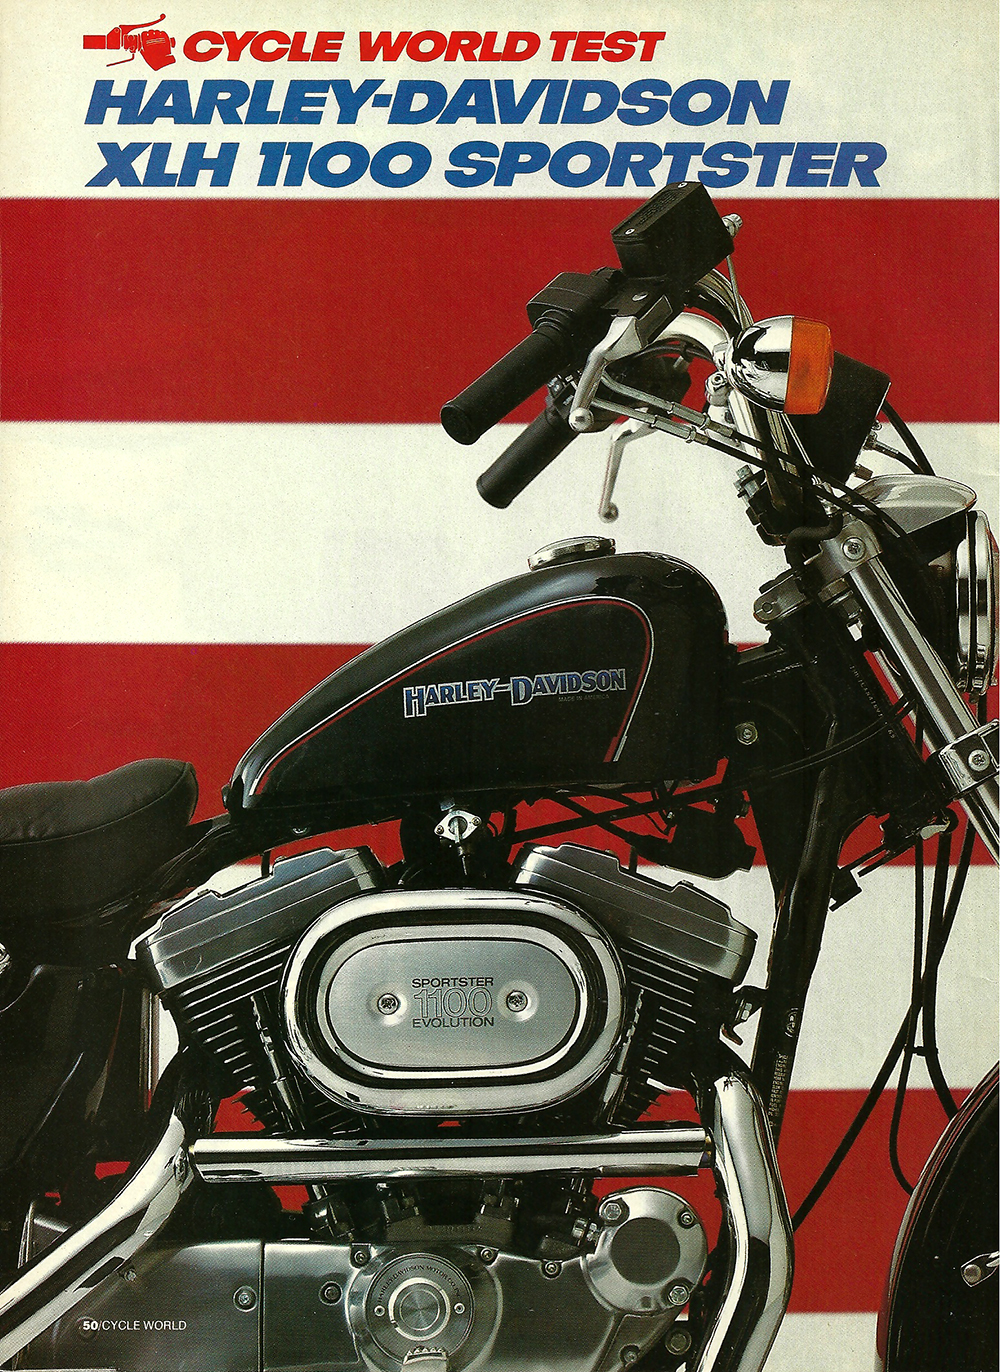 1985 Harley Davidson XLH 1100 Sportster road test 01.jpg